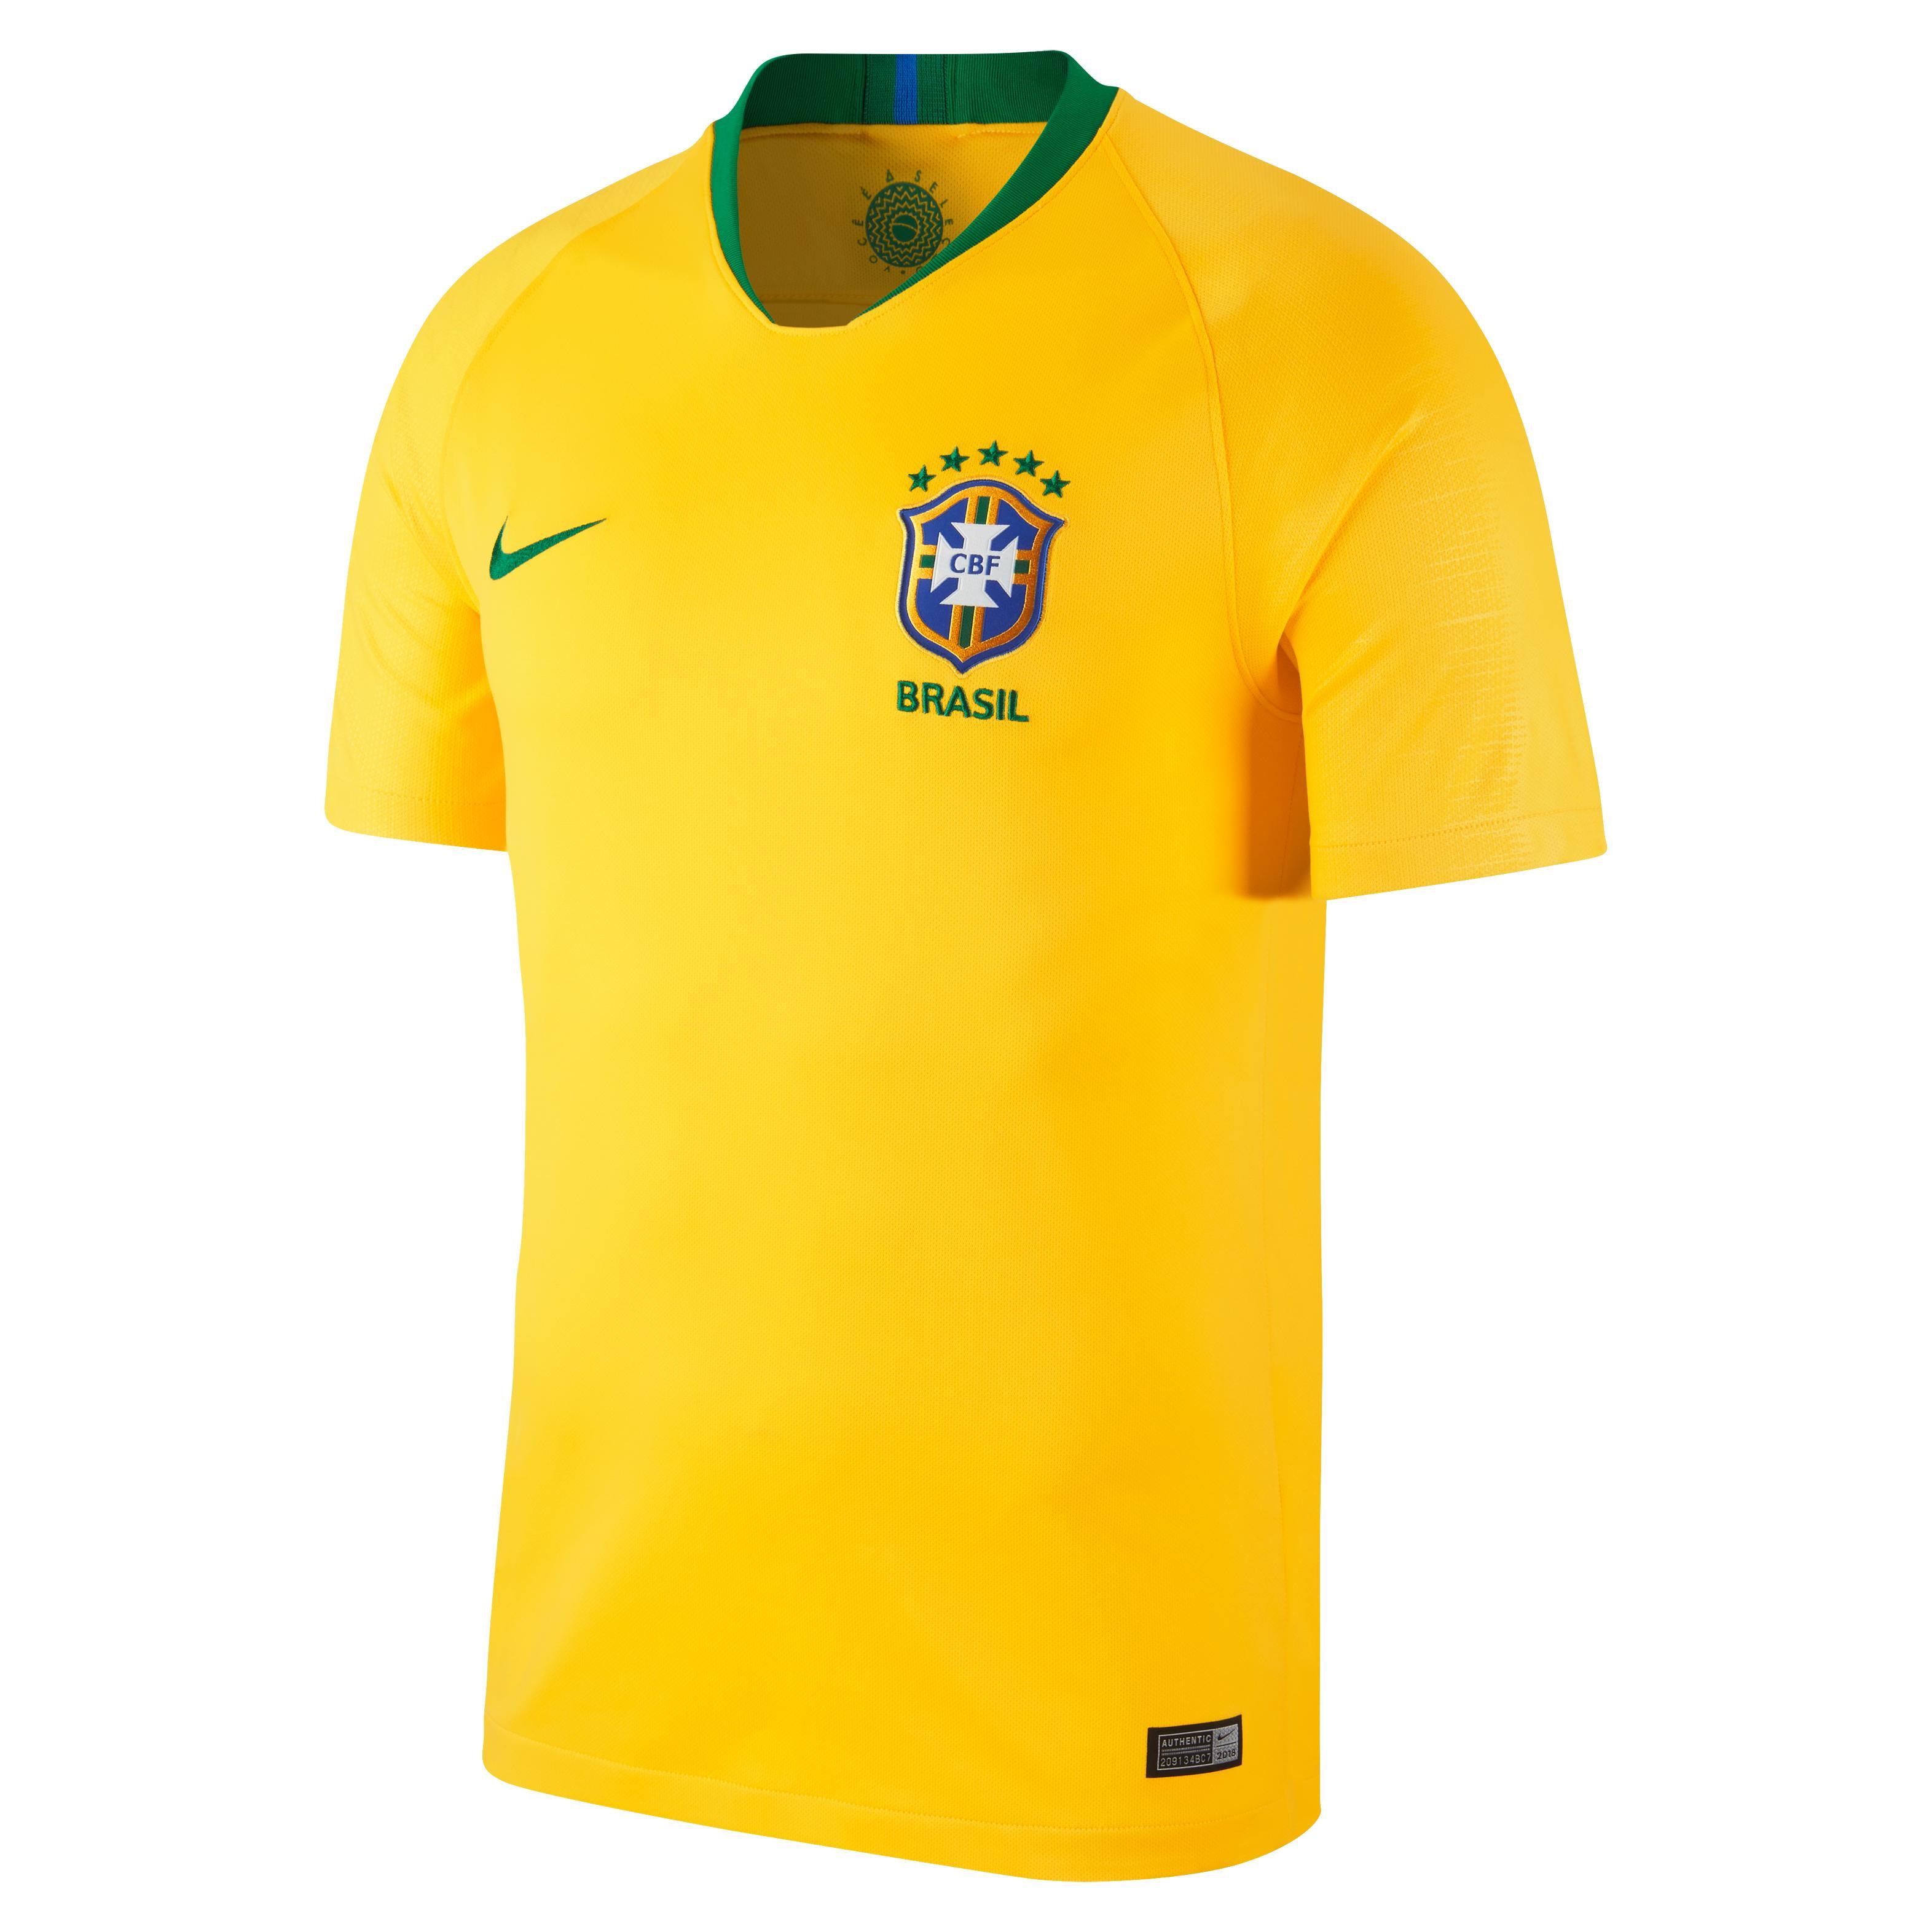 Tricou Replică Brazilia Copii